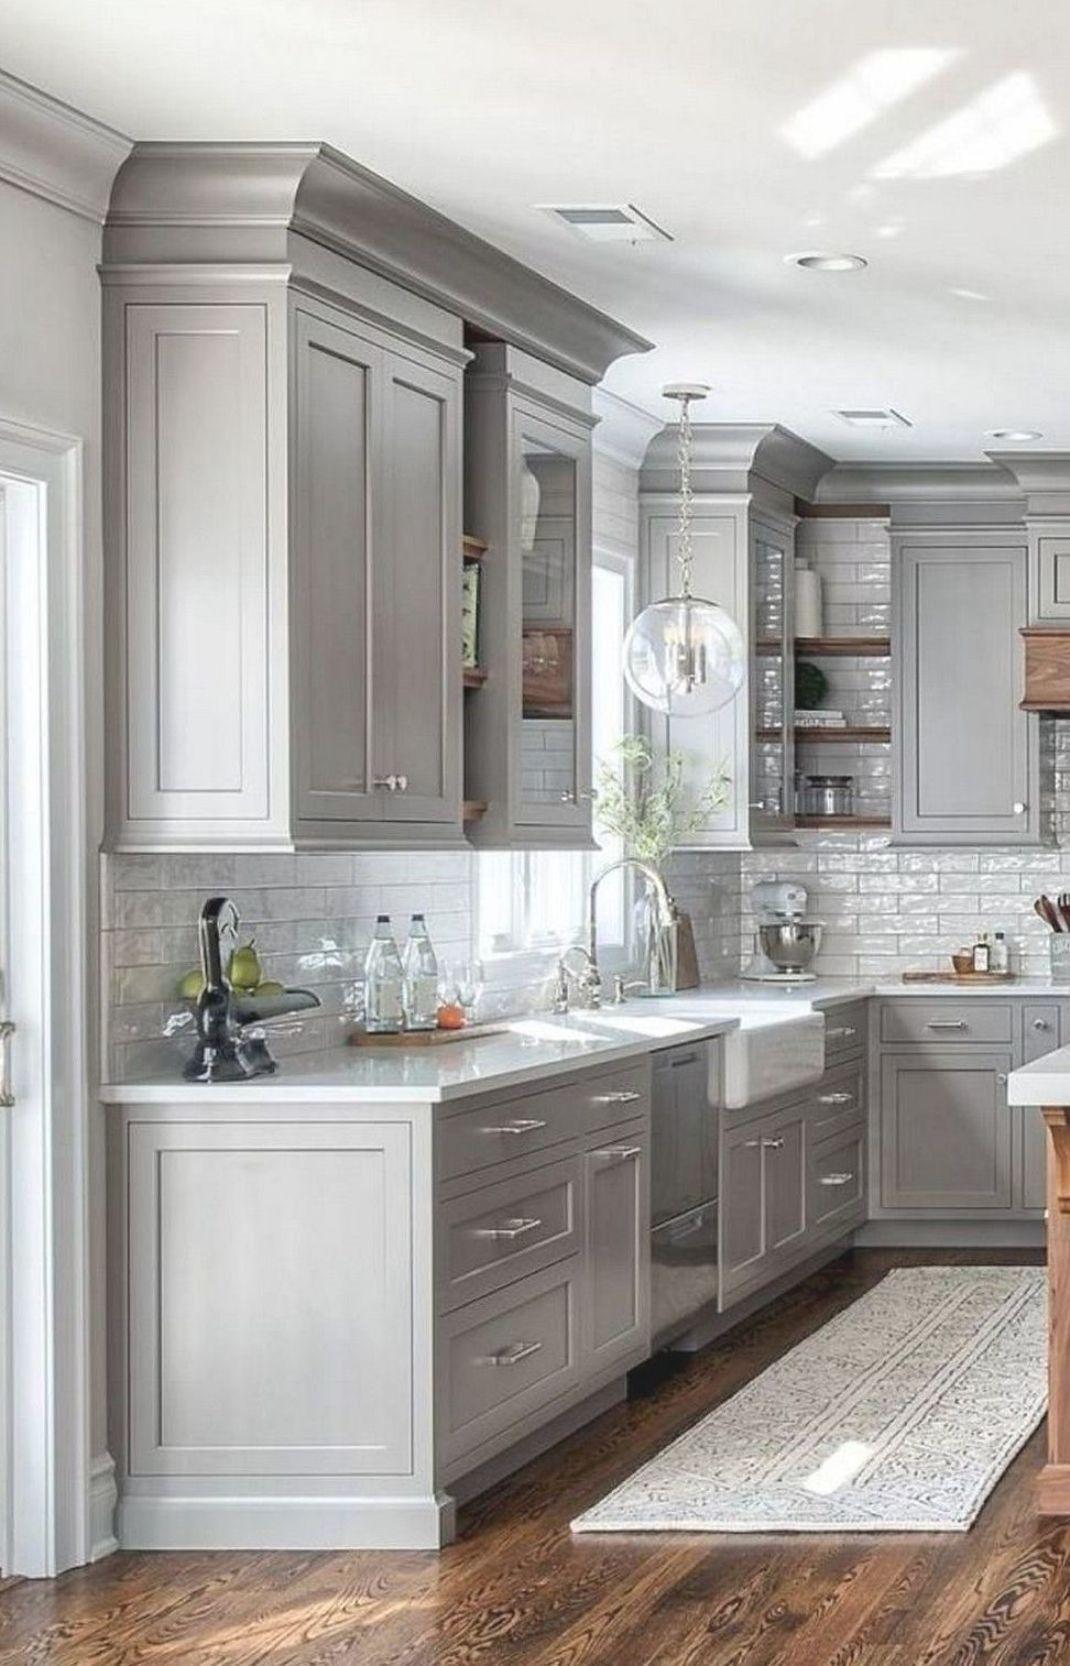 Stunning Modern Kitchen Cabinets Ideas #kitchencabinetideas #kitchendesign #kitchenideas #kitchenremodel